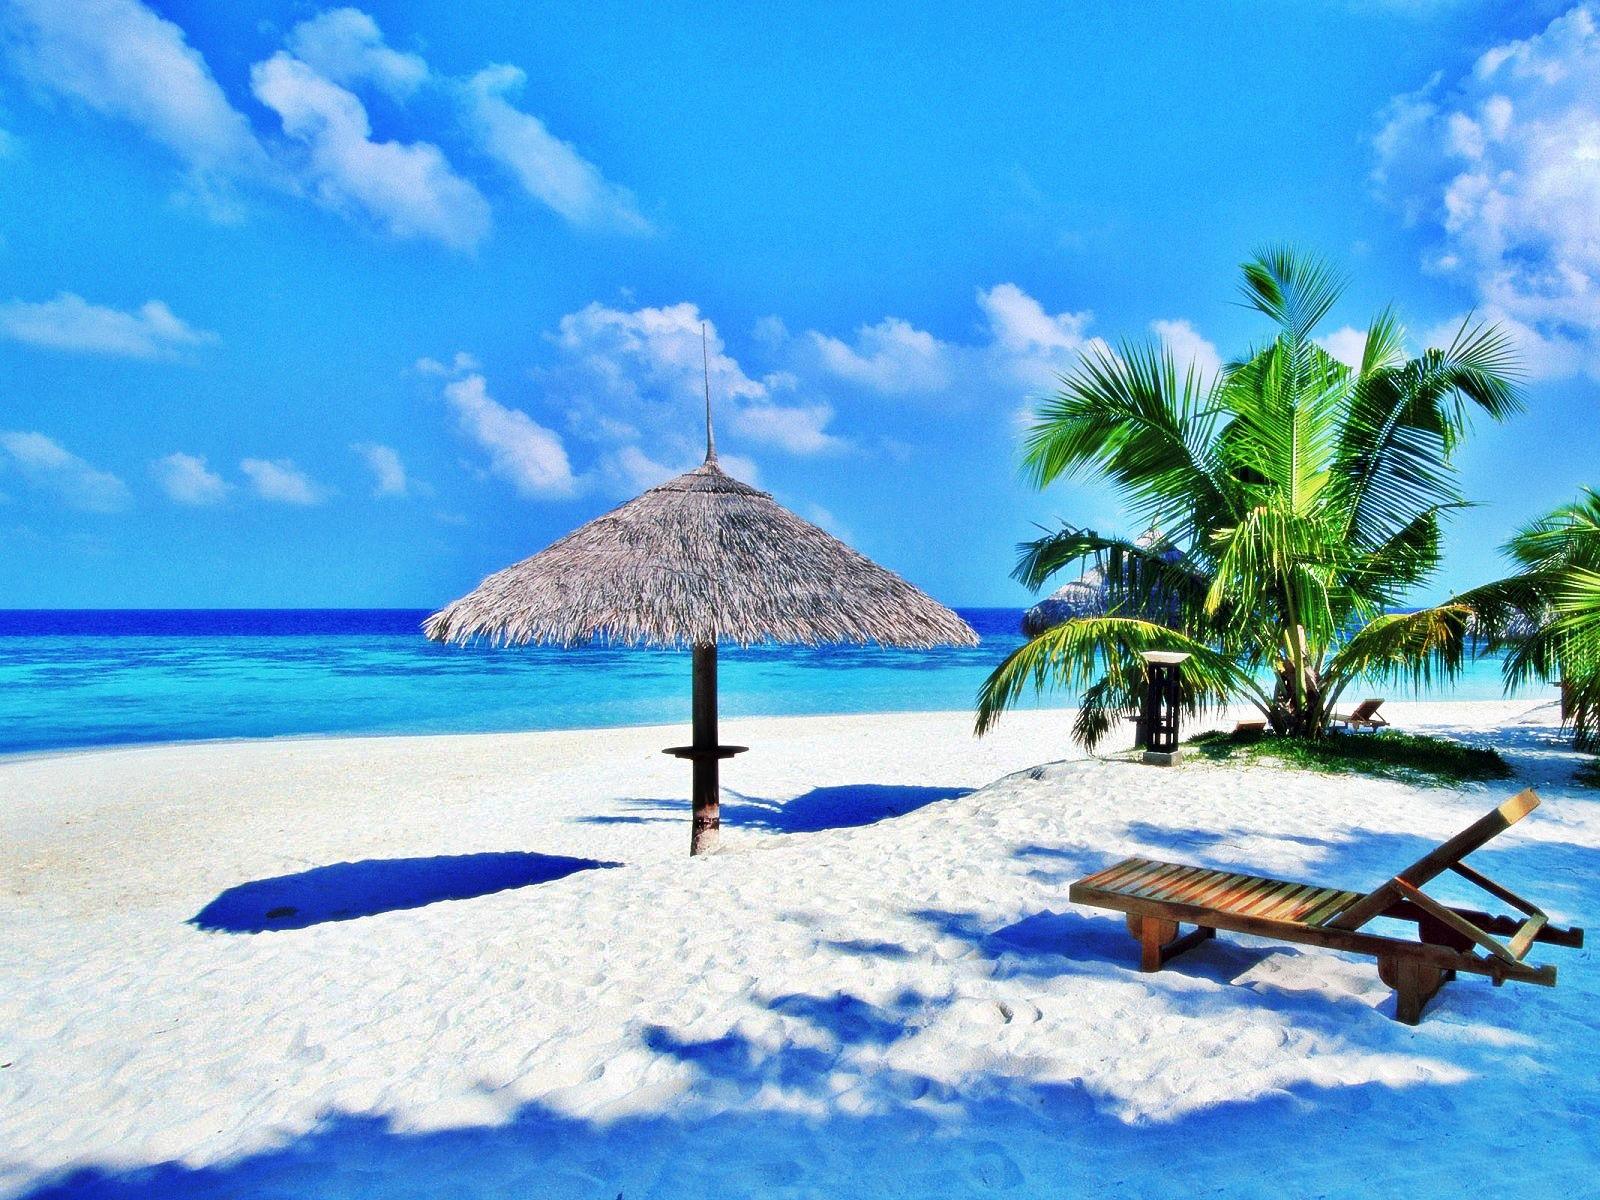 My Top 10 Travel Destinations Bali Indonesia